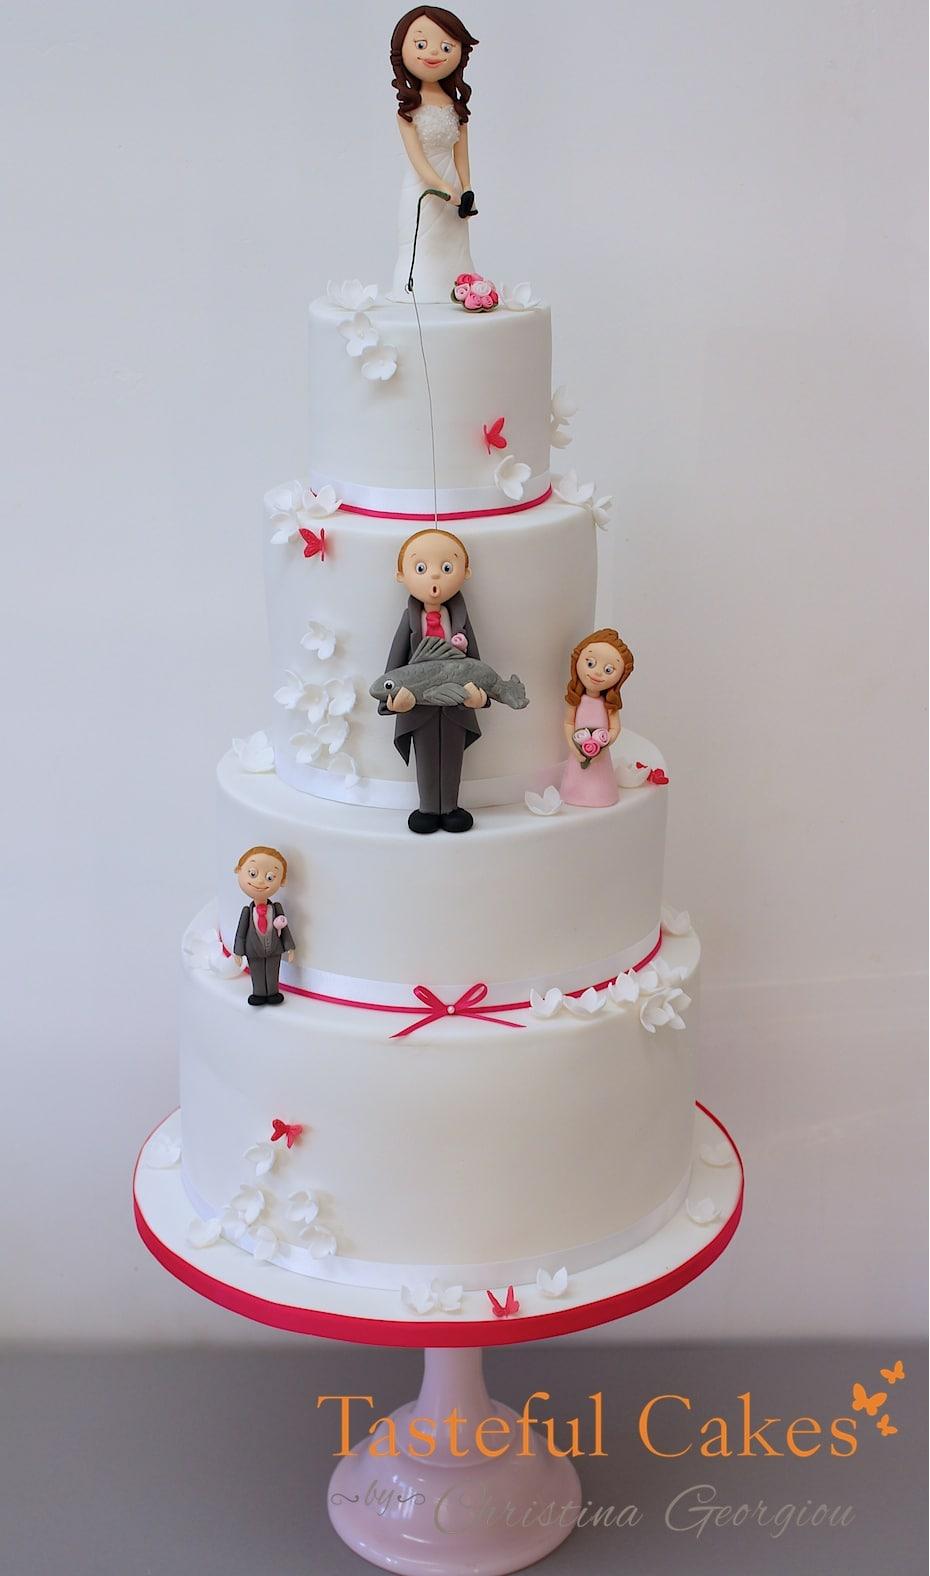 Tasteful Cakes By Christina Georgiou